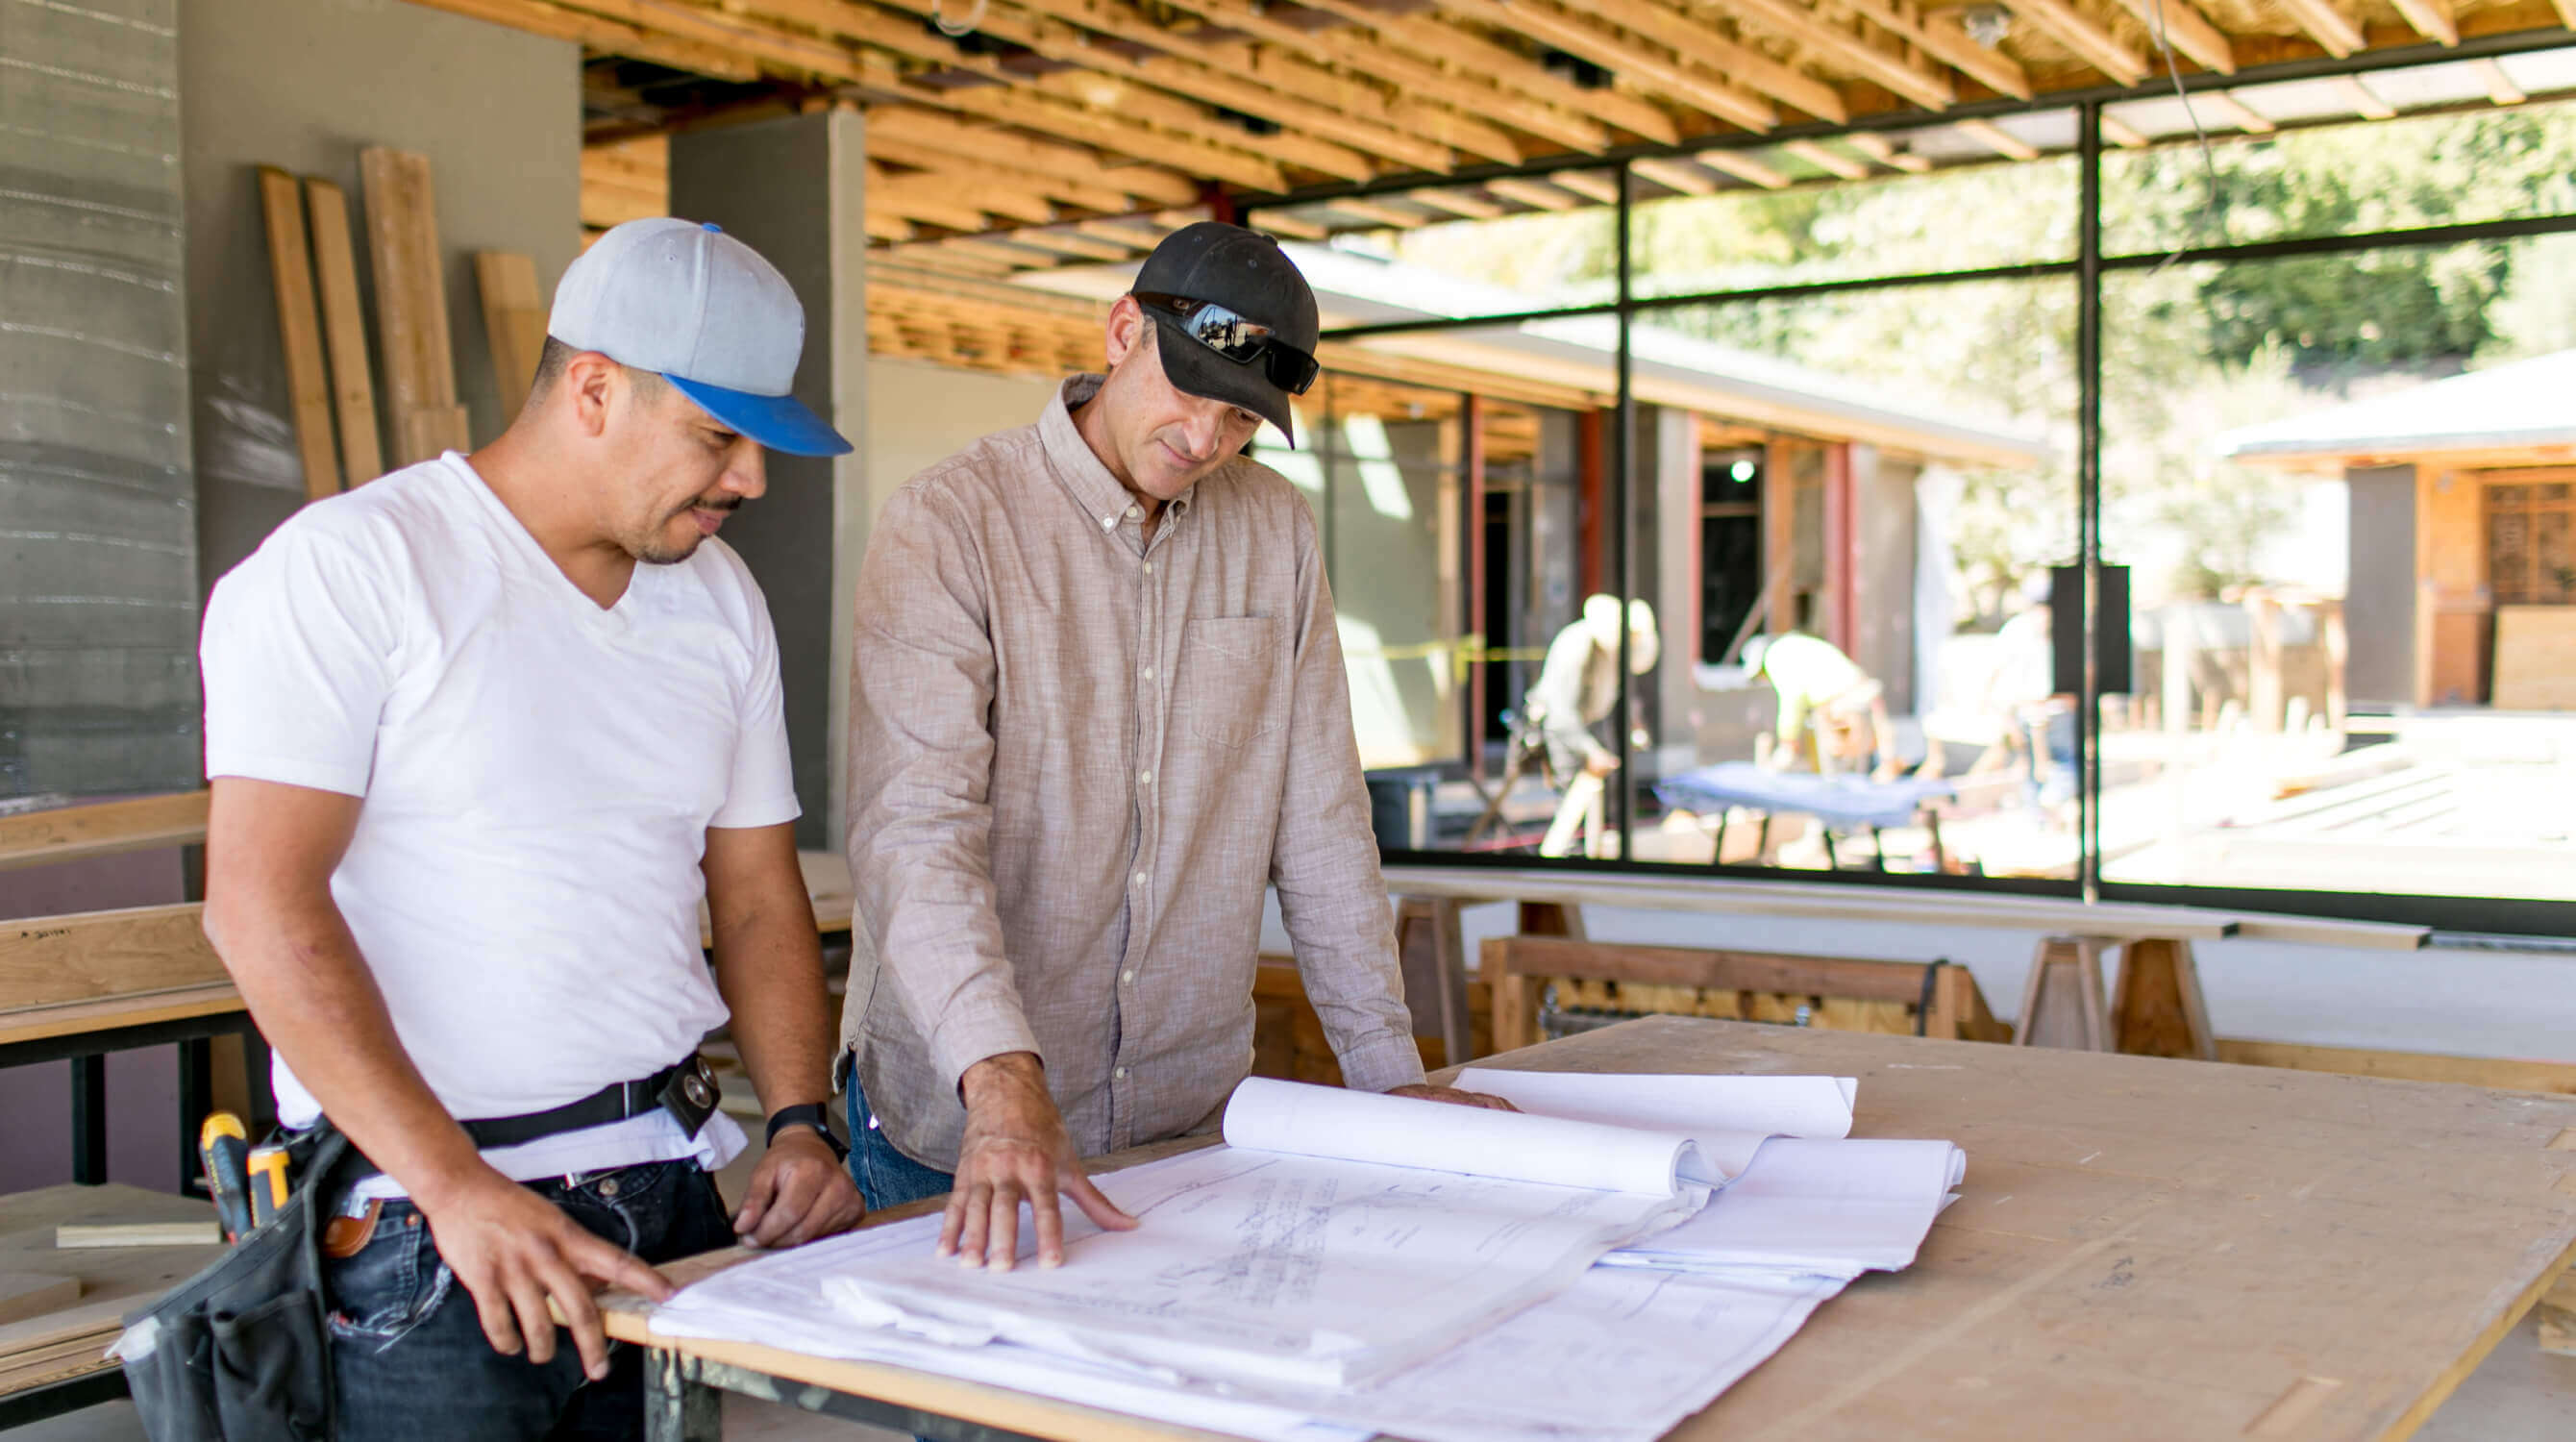 Hubstaff for construction companies